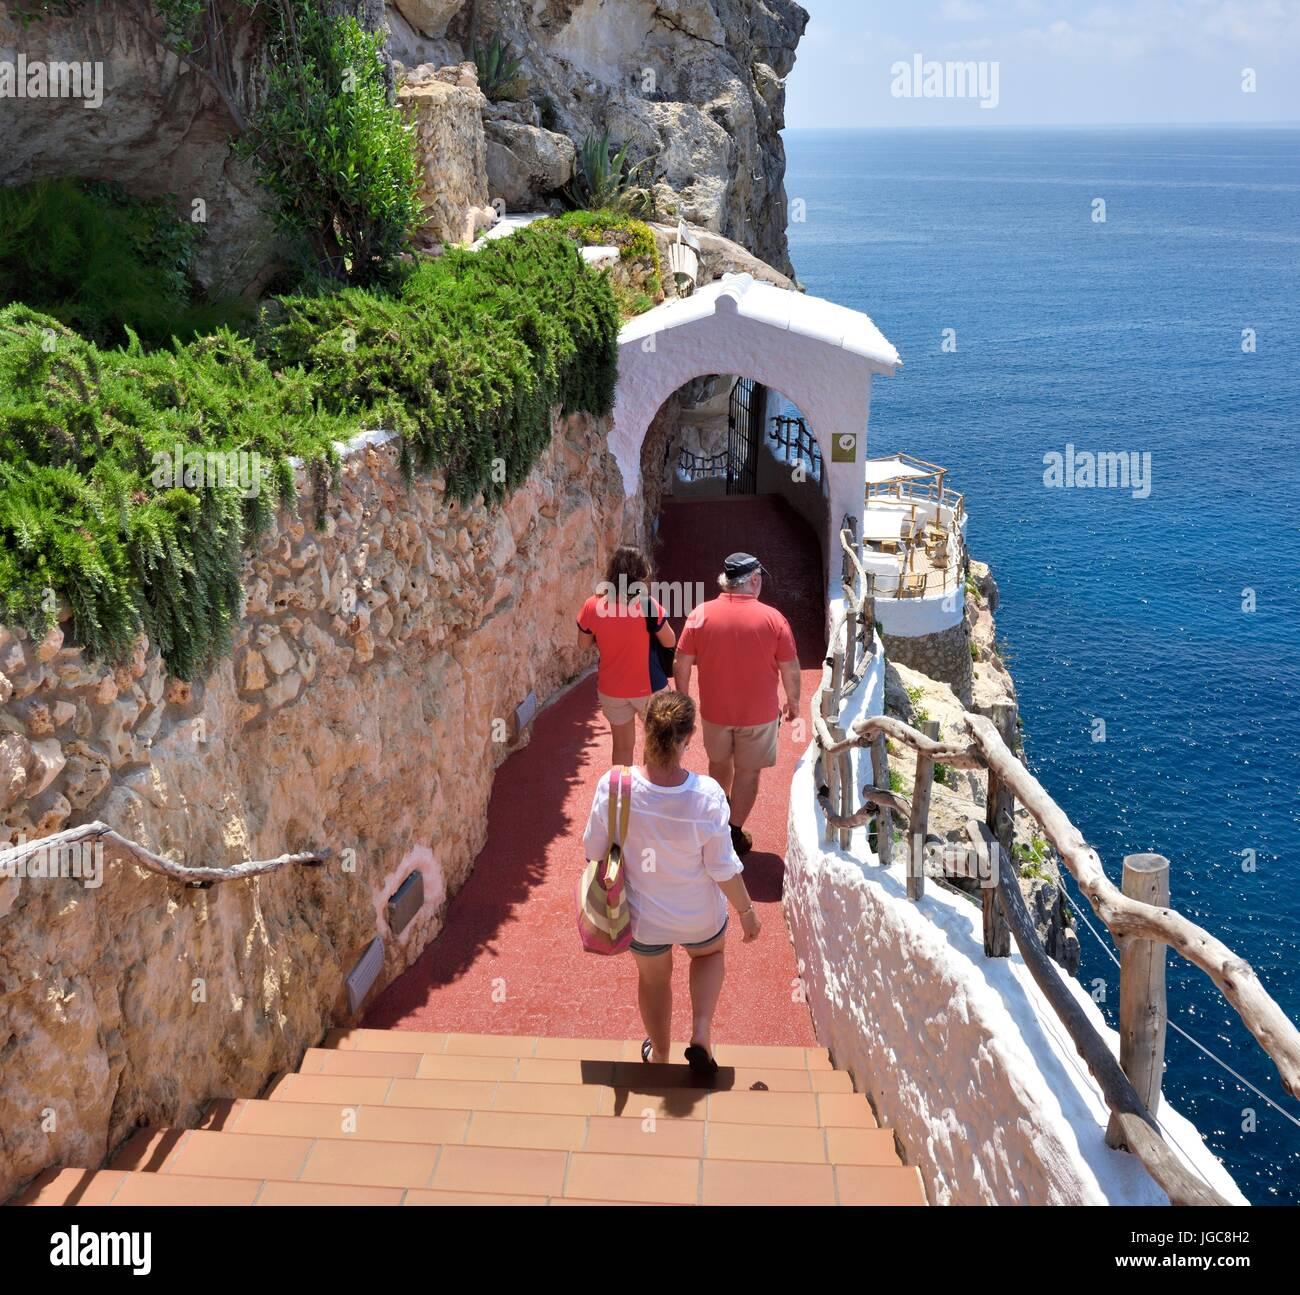 Cova d'en Xoroi Menorca Balearic islands Spain - Stock Image